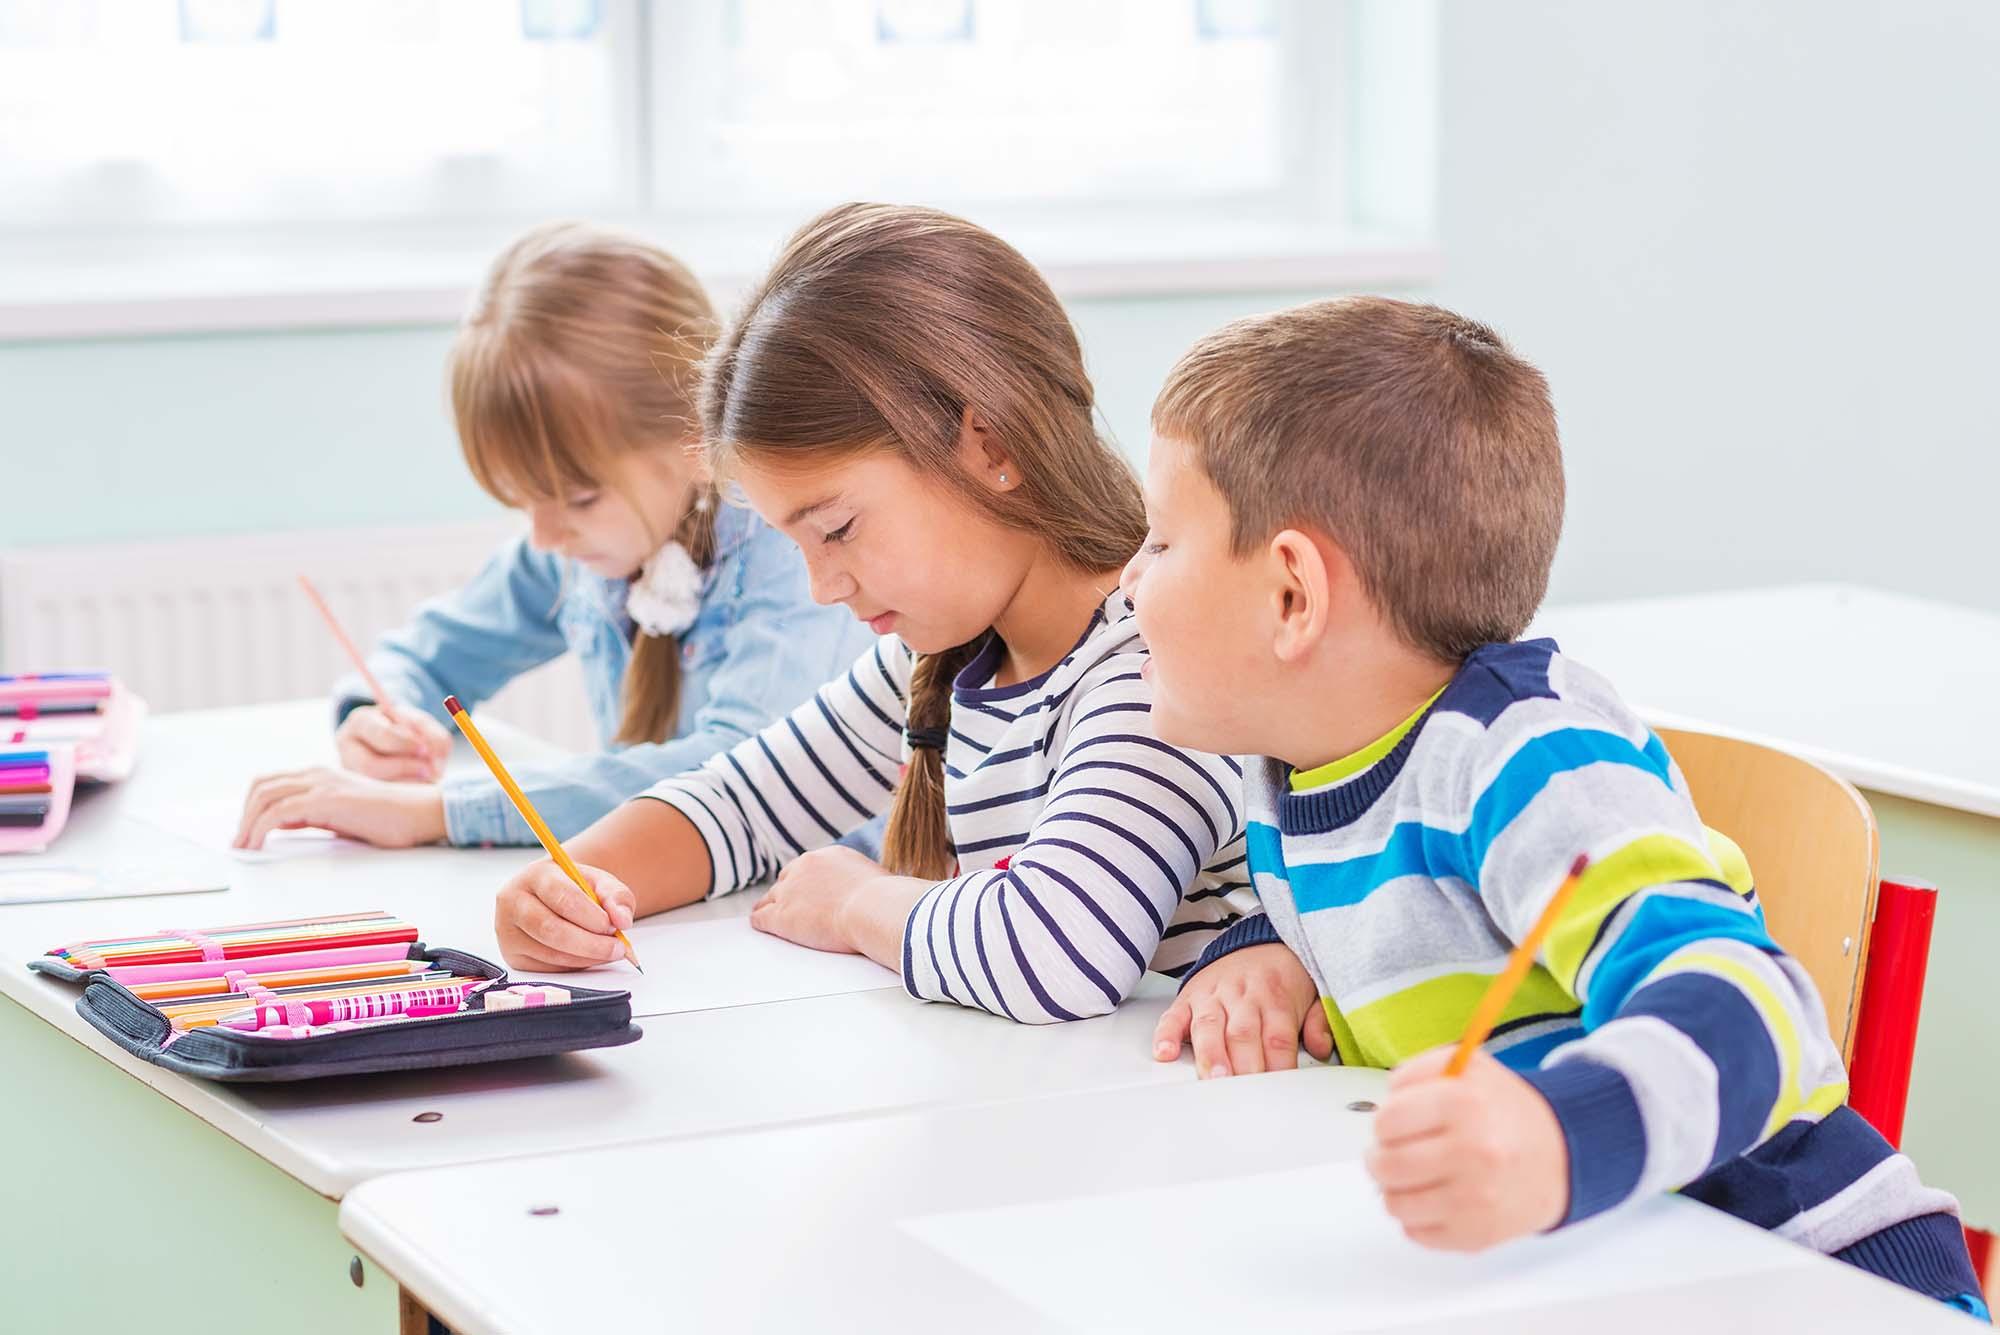 11 Plus School Holiday Workshops